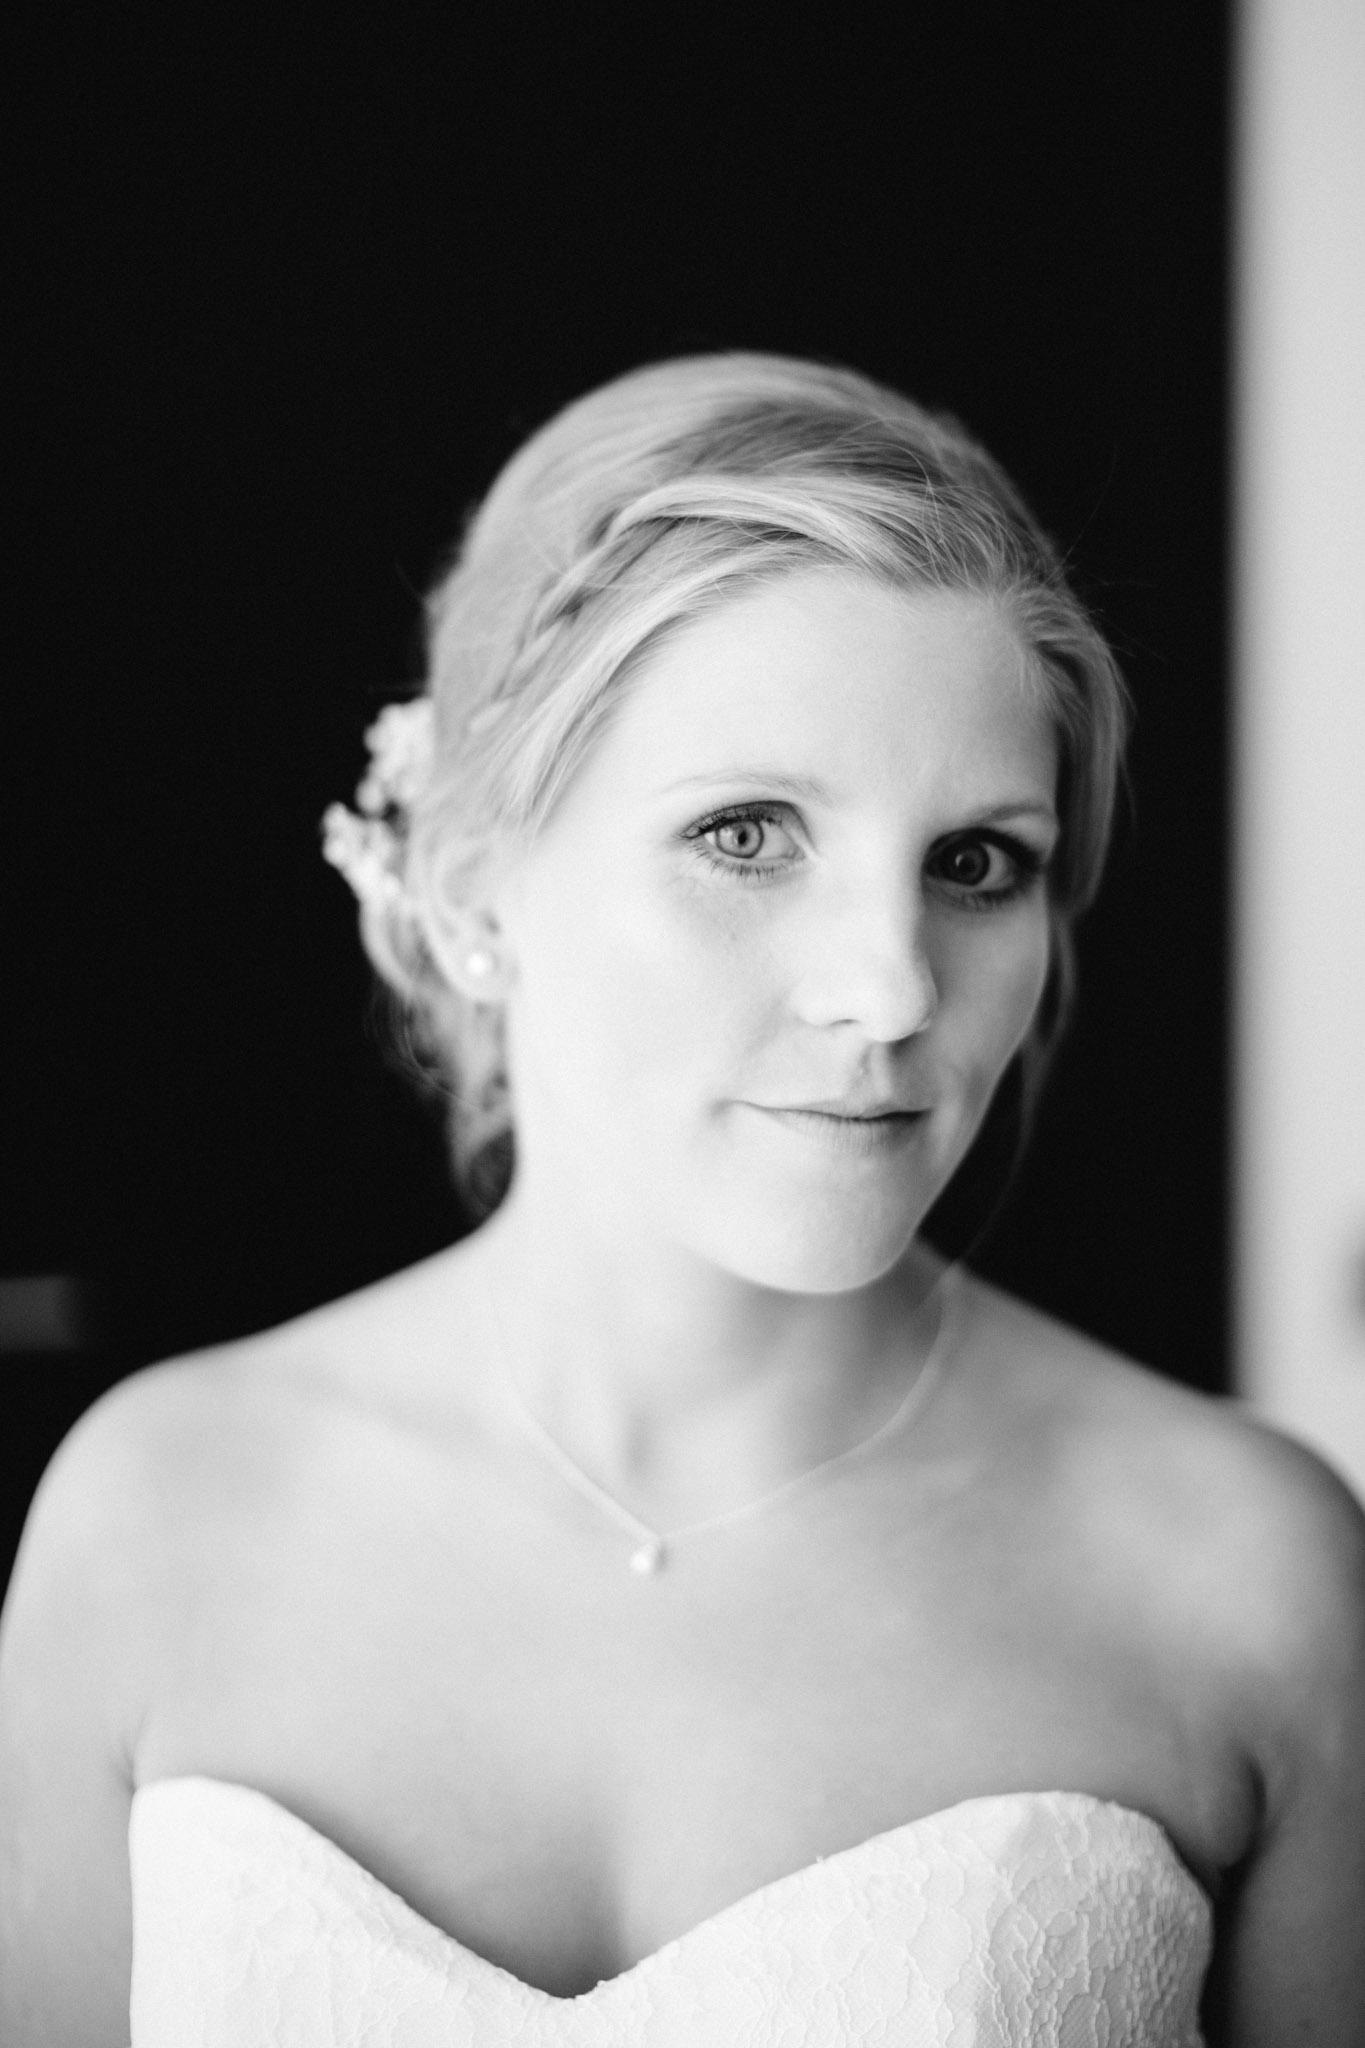 Lilienhof-Freiburg-Hochzeit-Pia-Anna-Christian-Wedding-Photography-FS-18.jpg